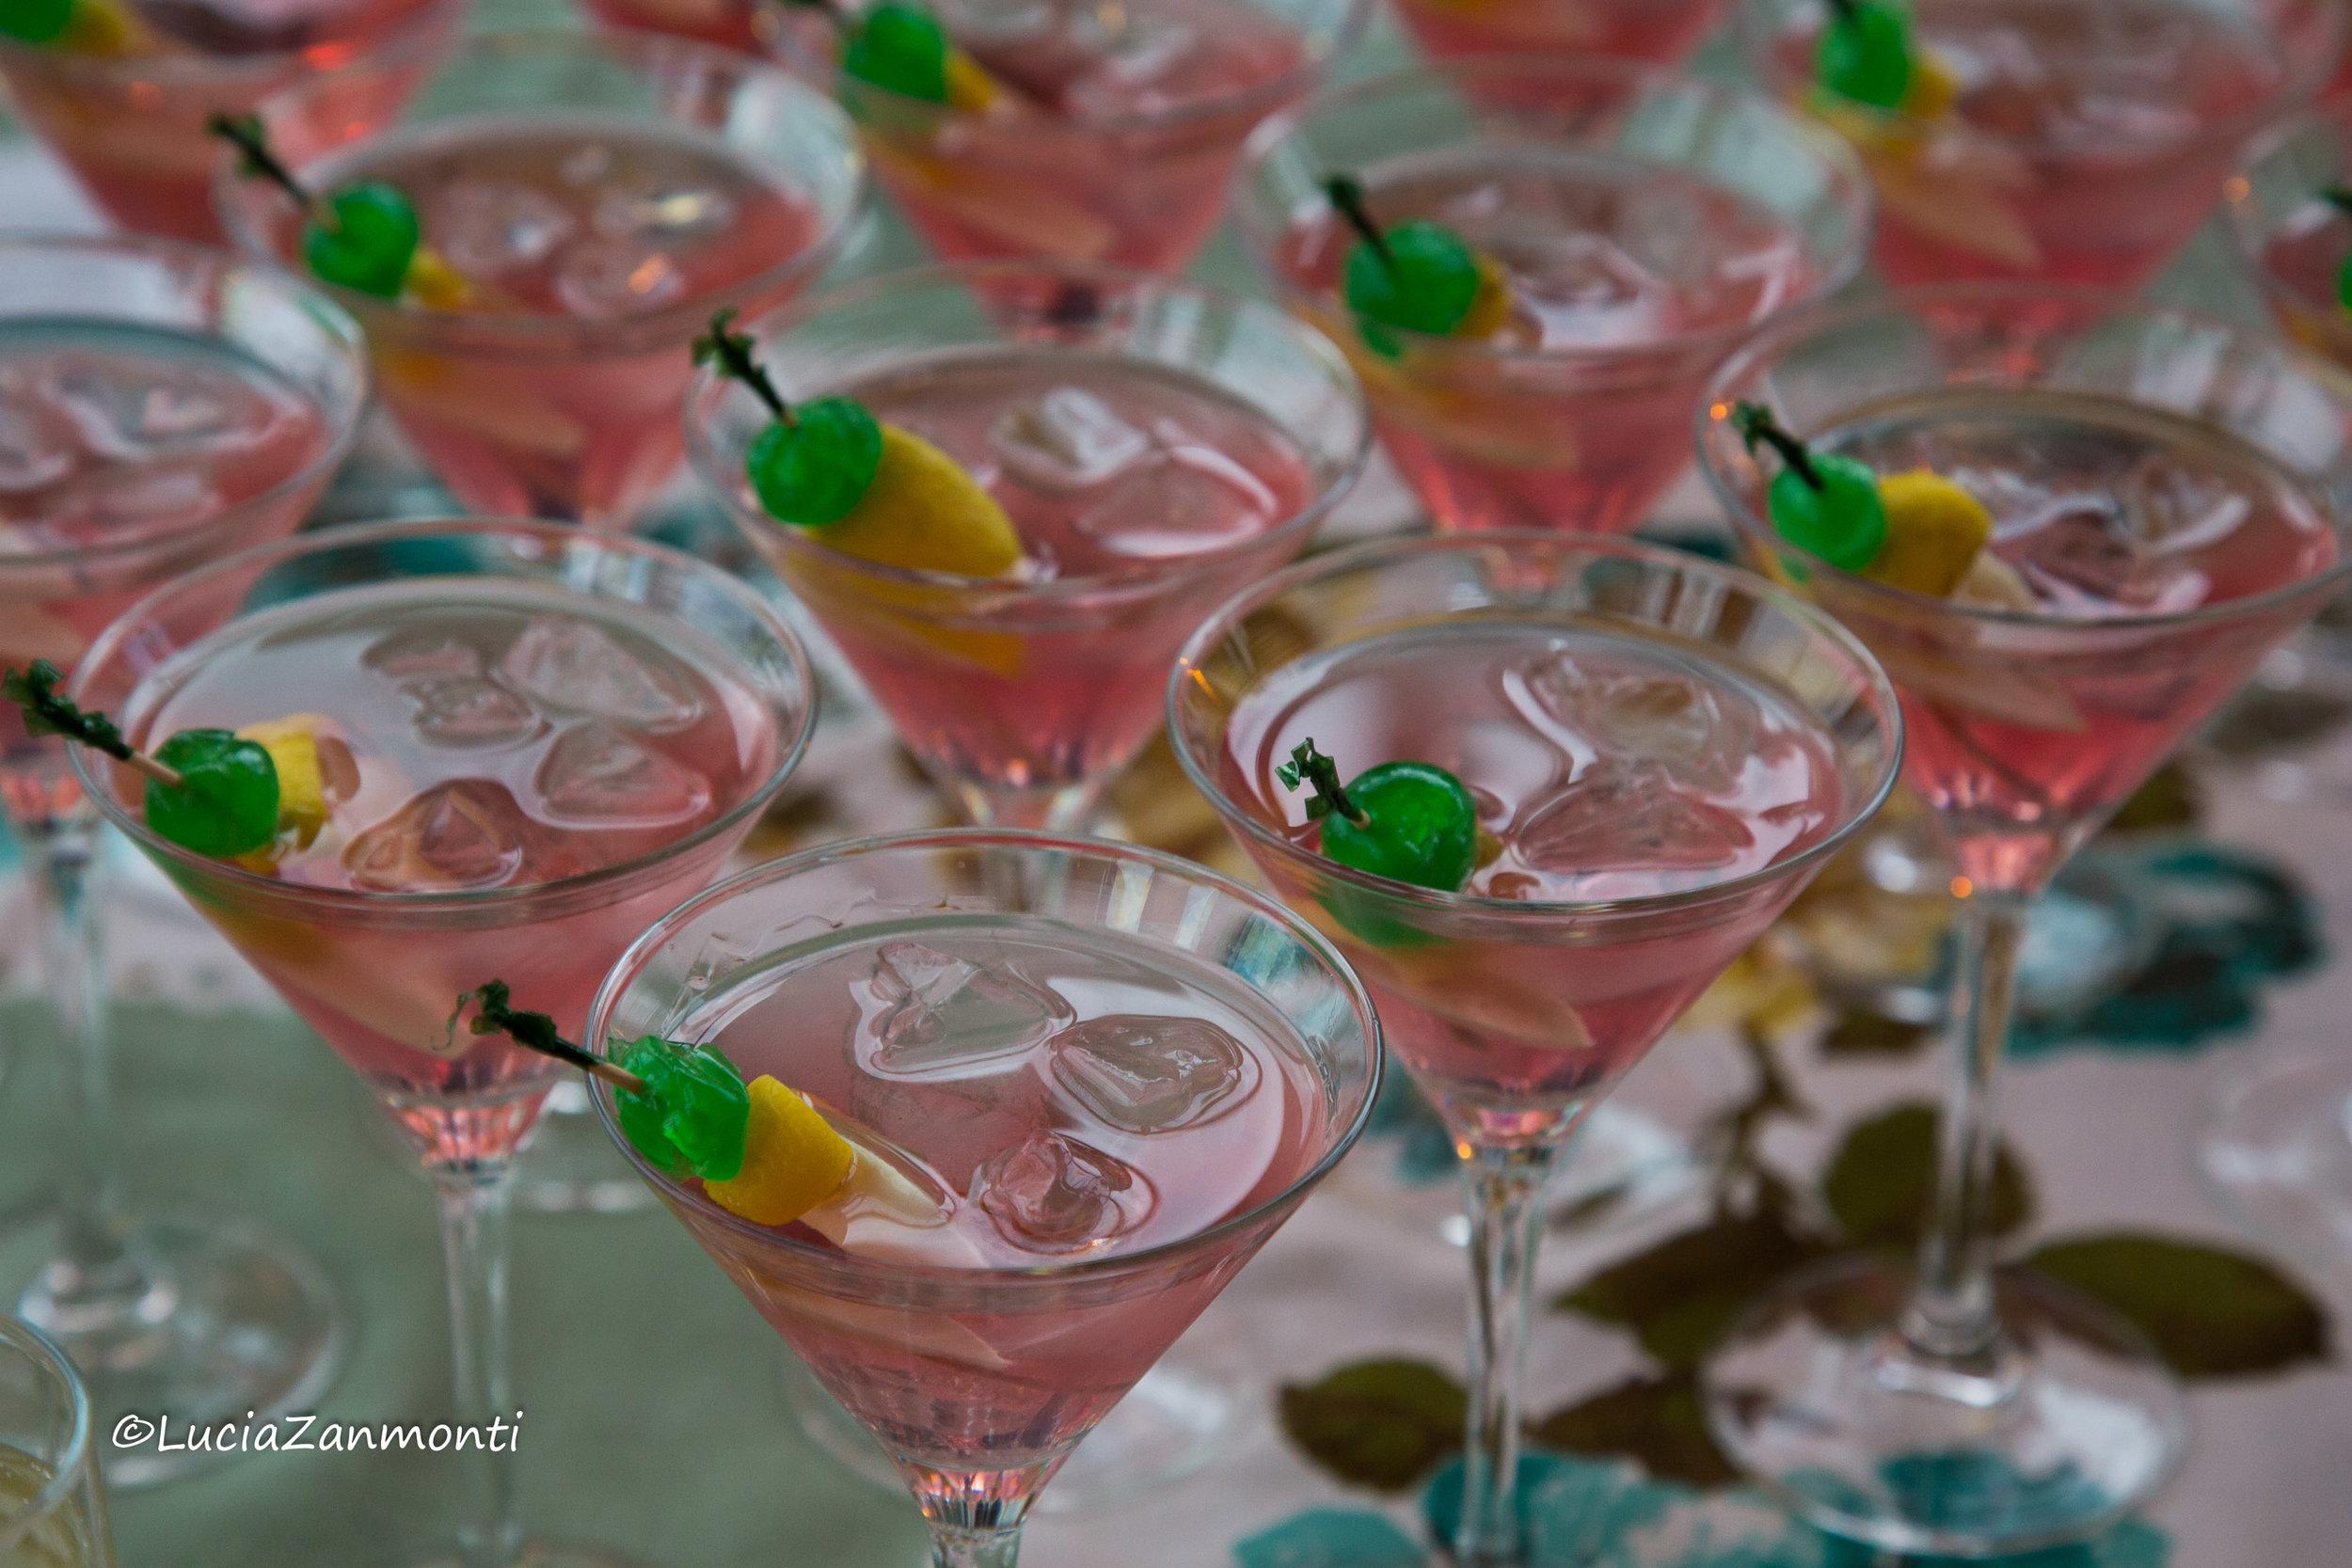 cocktail wairarapa photography.jpg